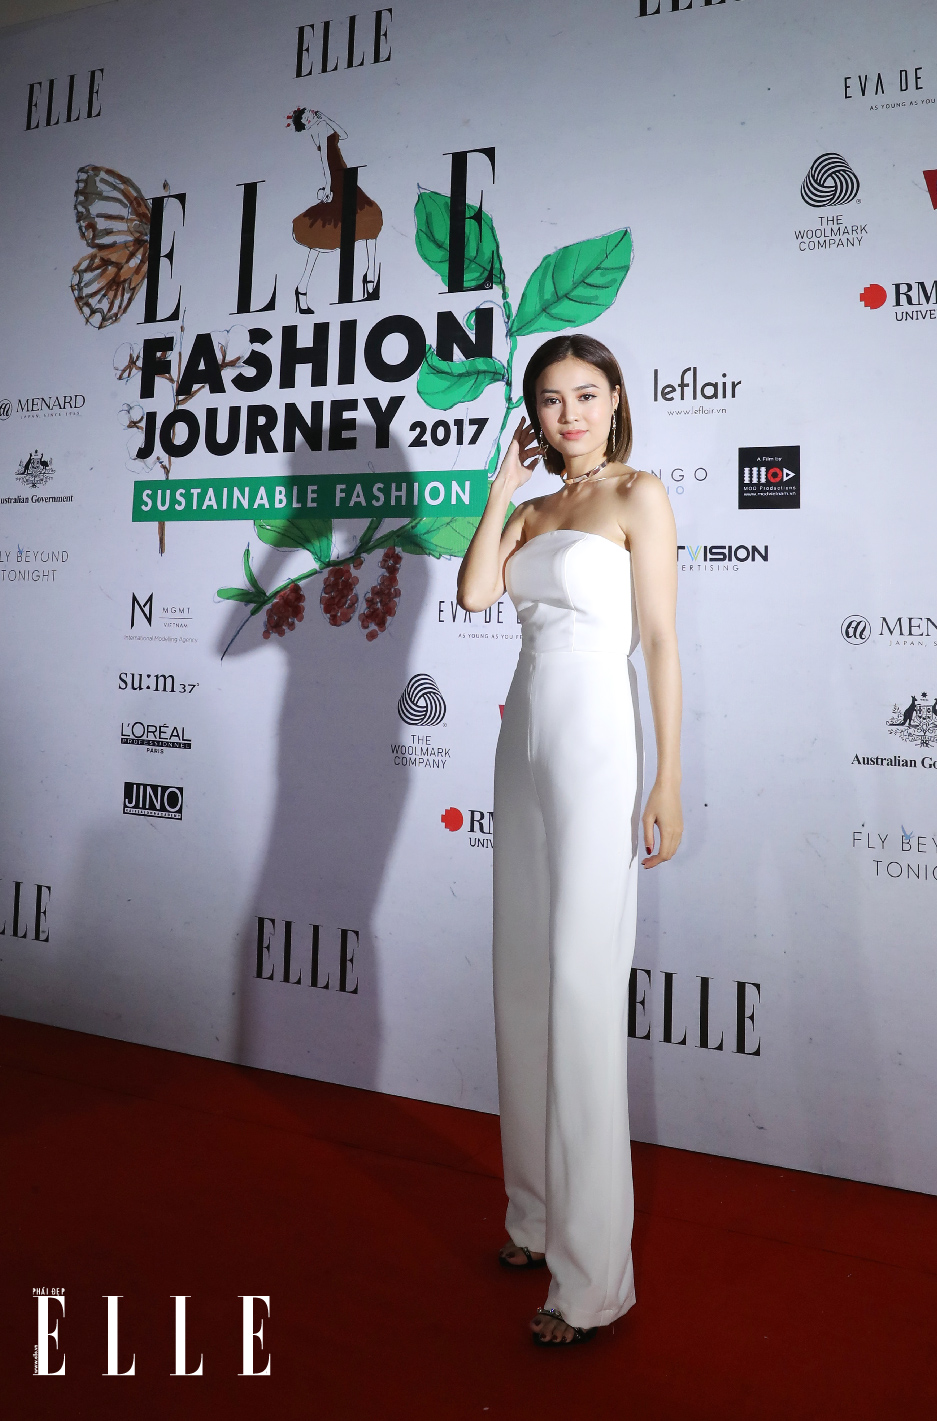 elle fashion journey 2017 33